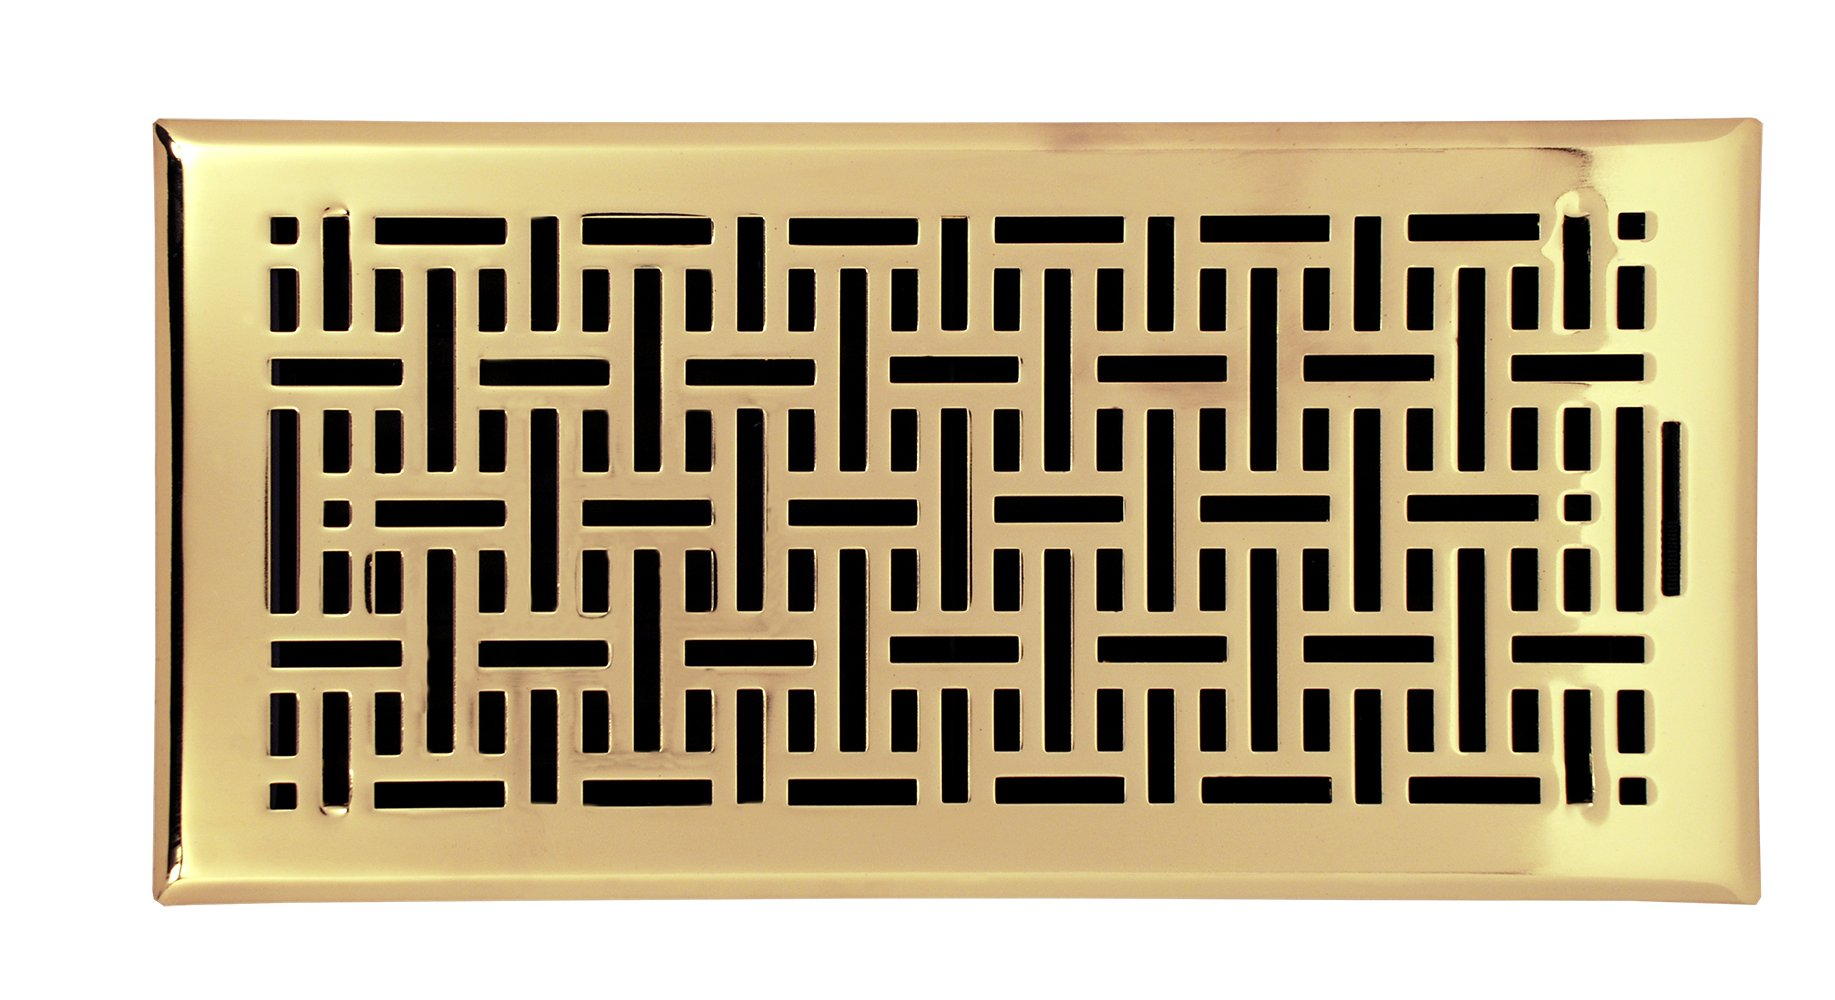 Accord Ventilation AMFRPBB614 Wicker Design Floor Register, Polished Brass, 6'' x 14'', Gold